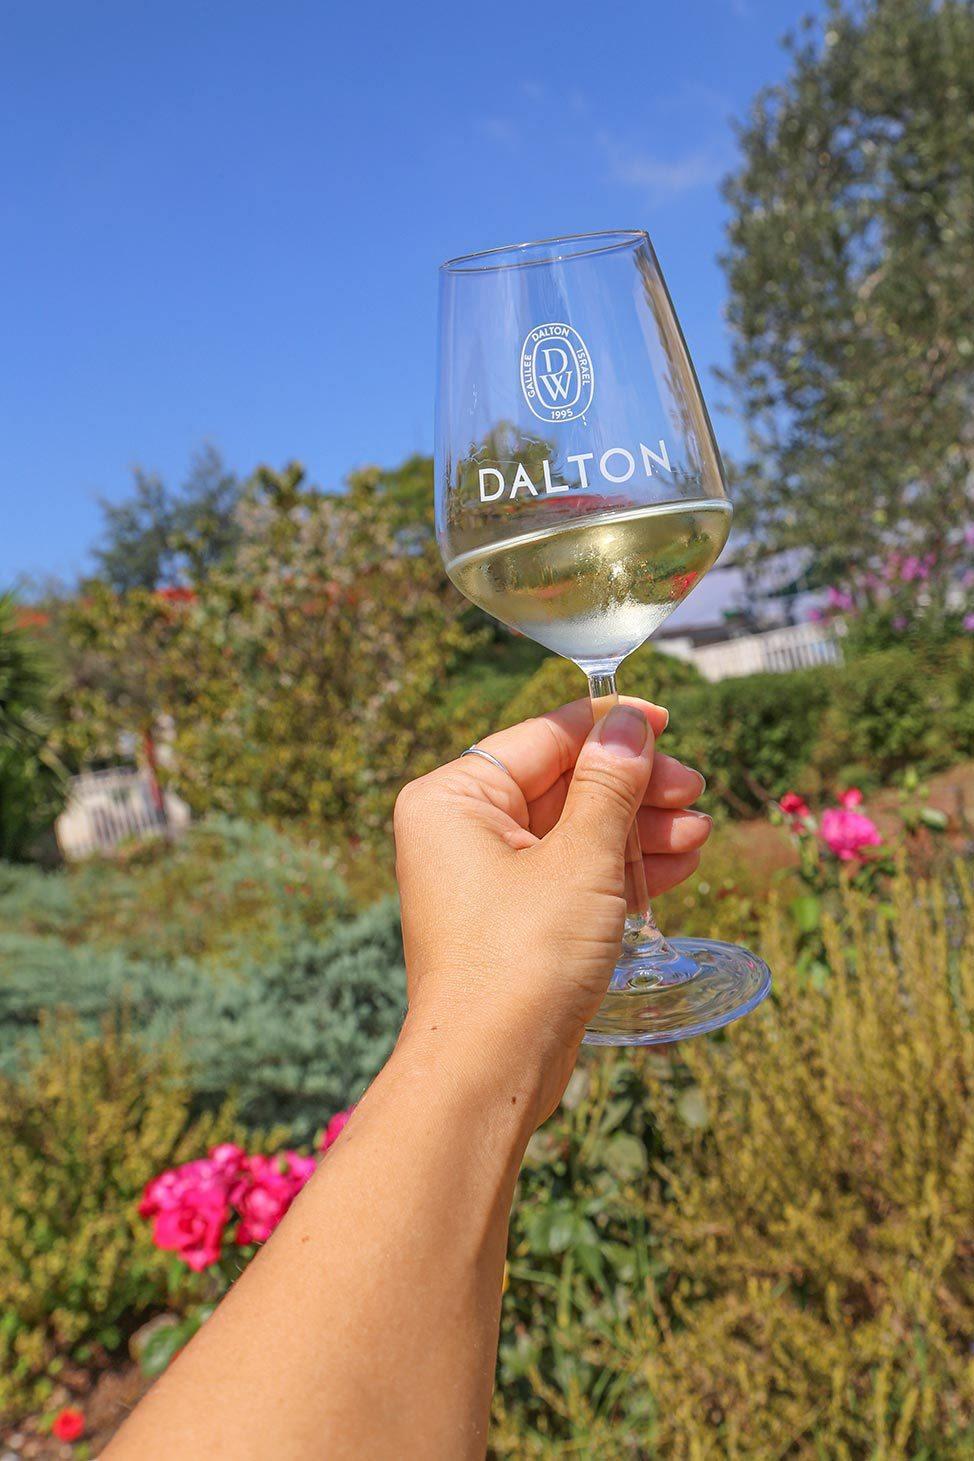 Dalton Winery, Galilee, Isreal